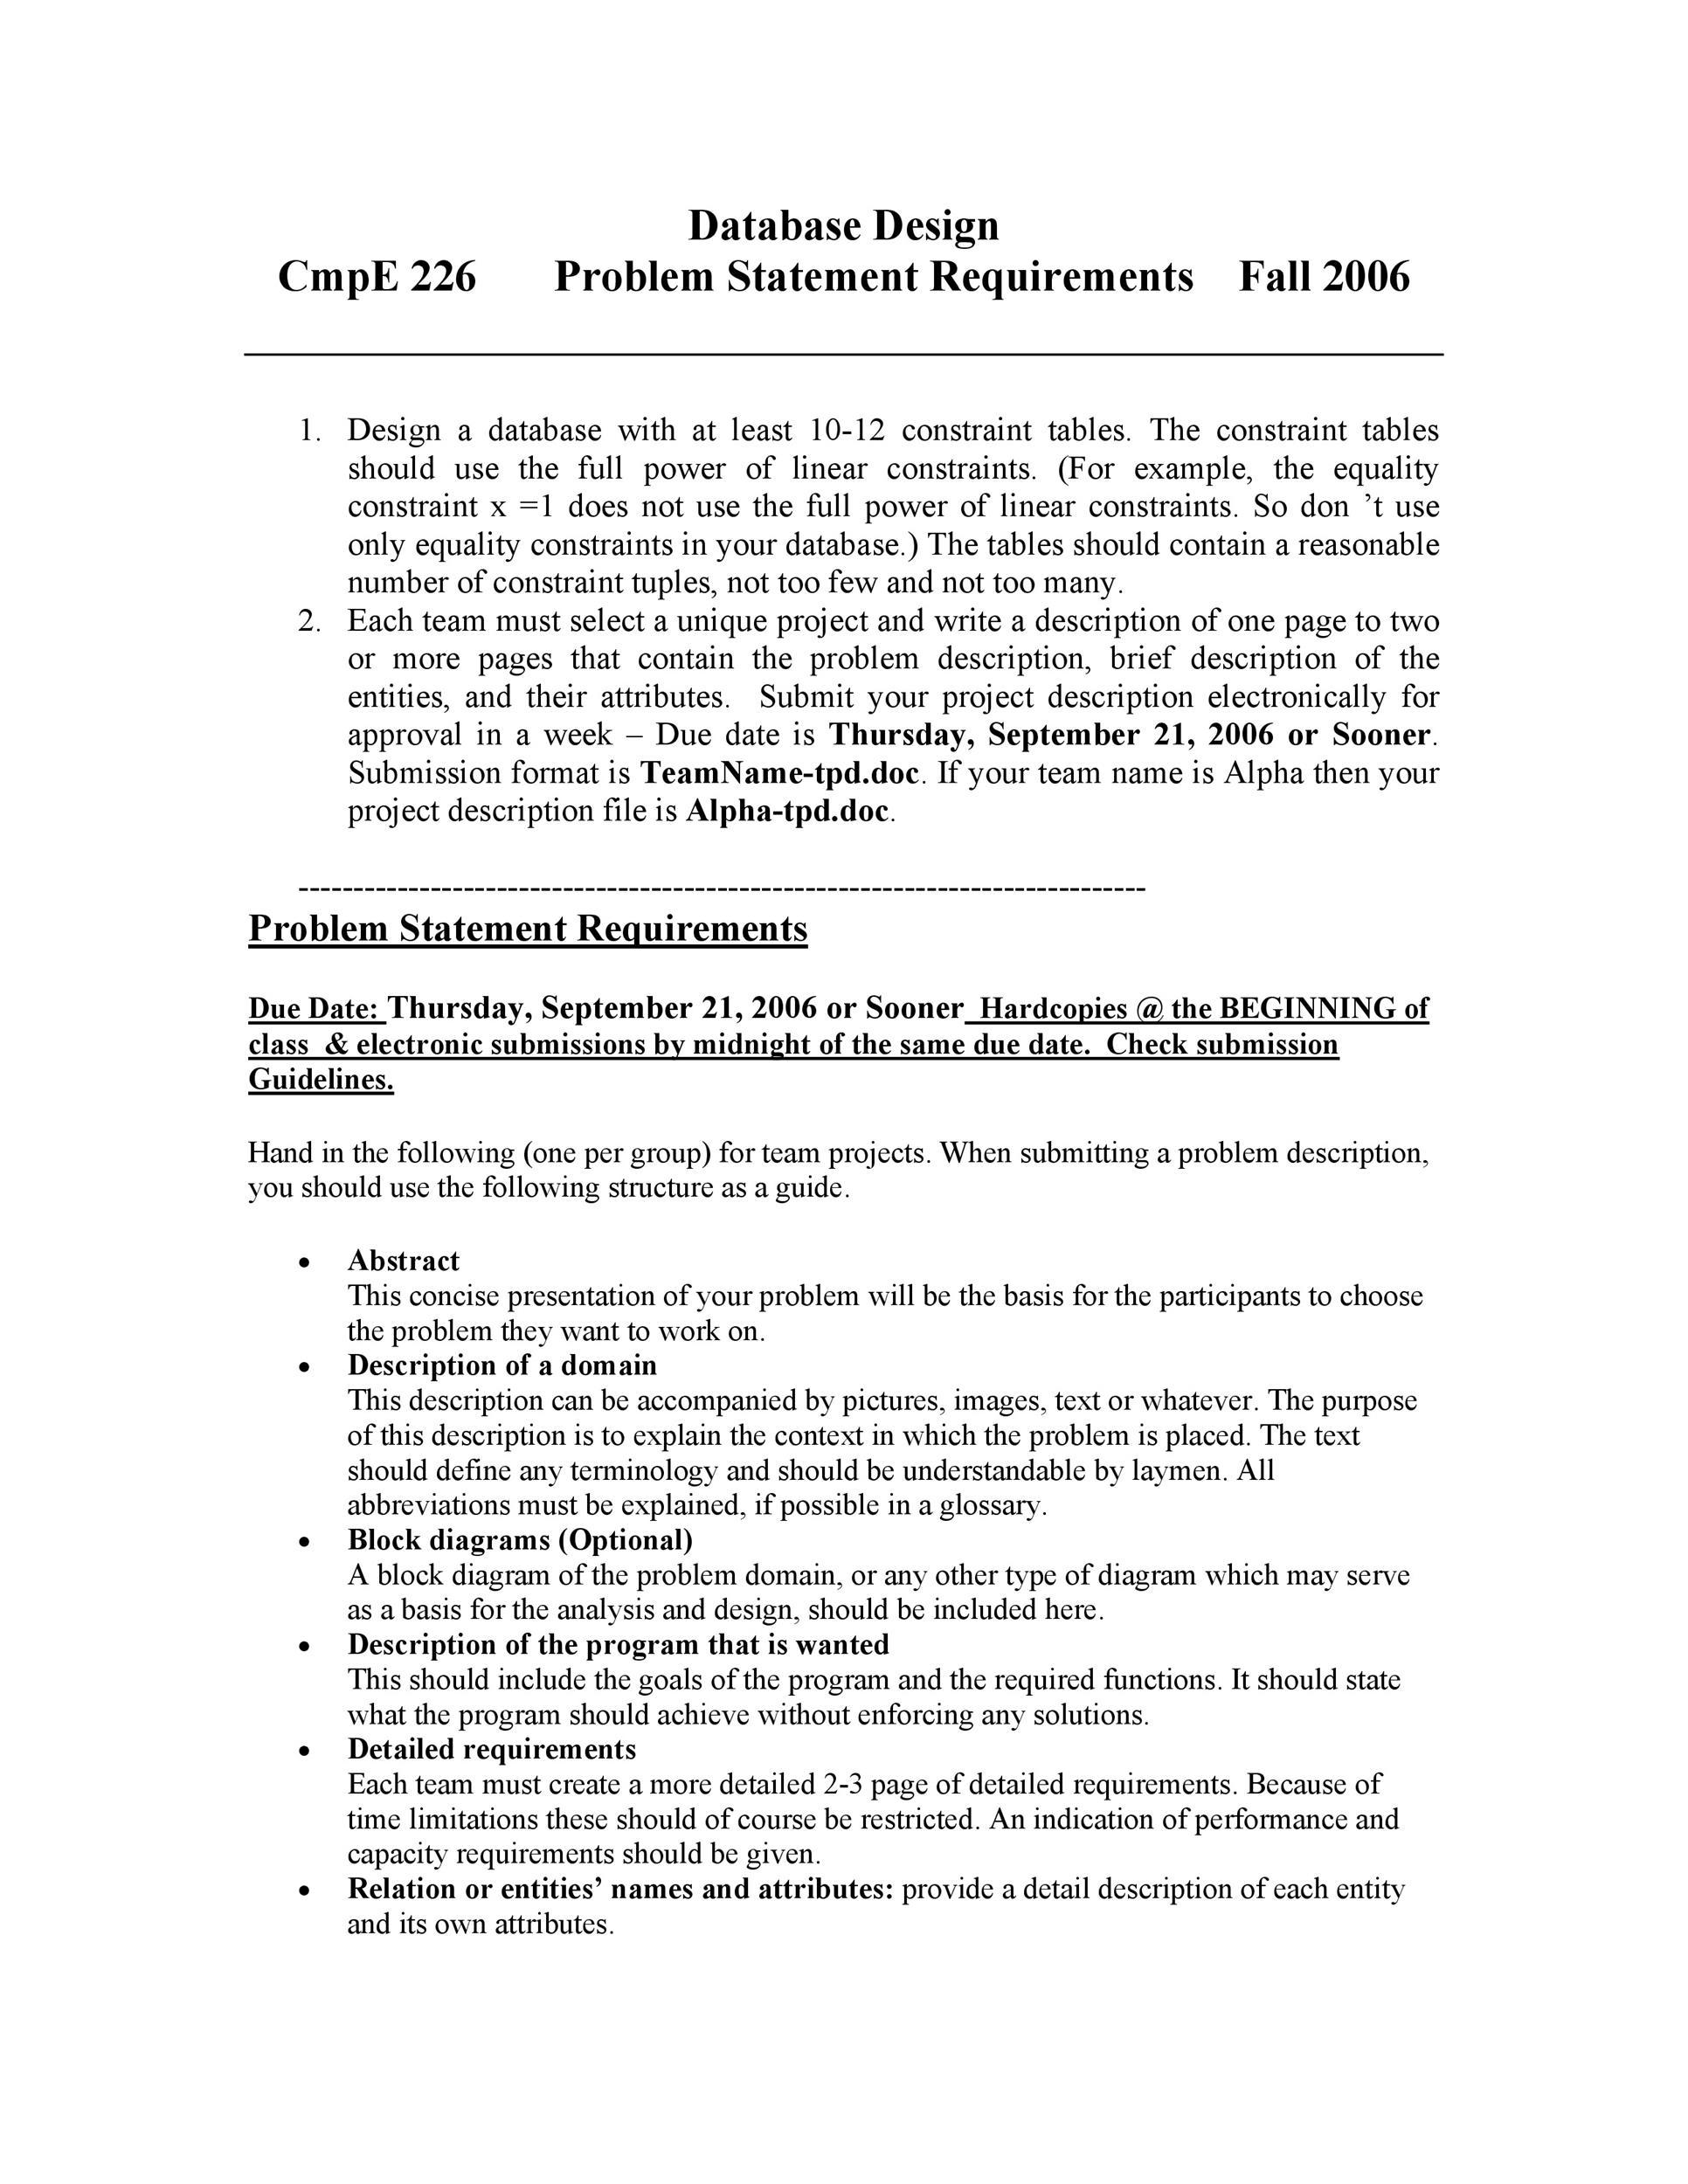 Free Problem Statement Template 11